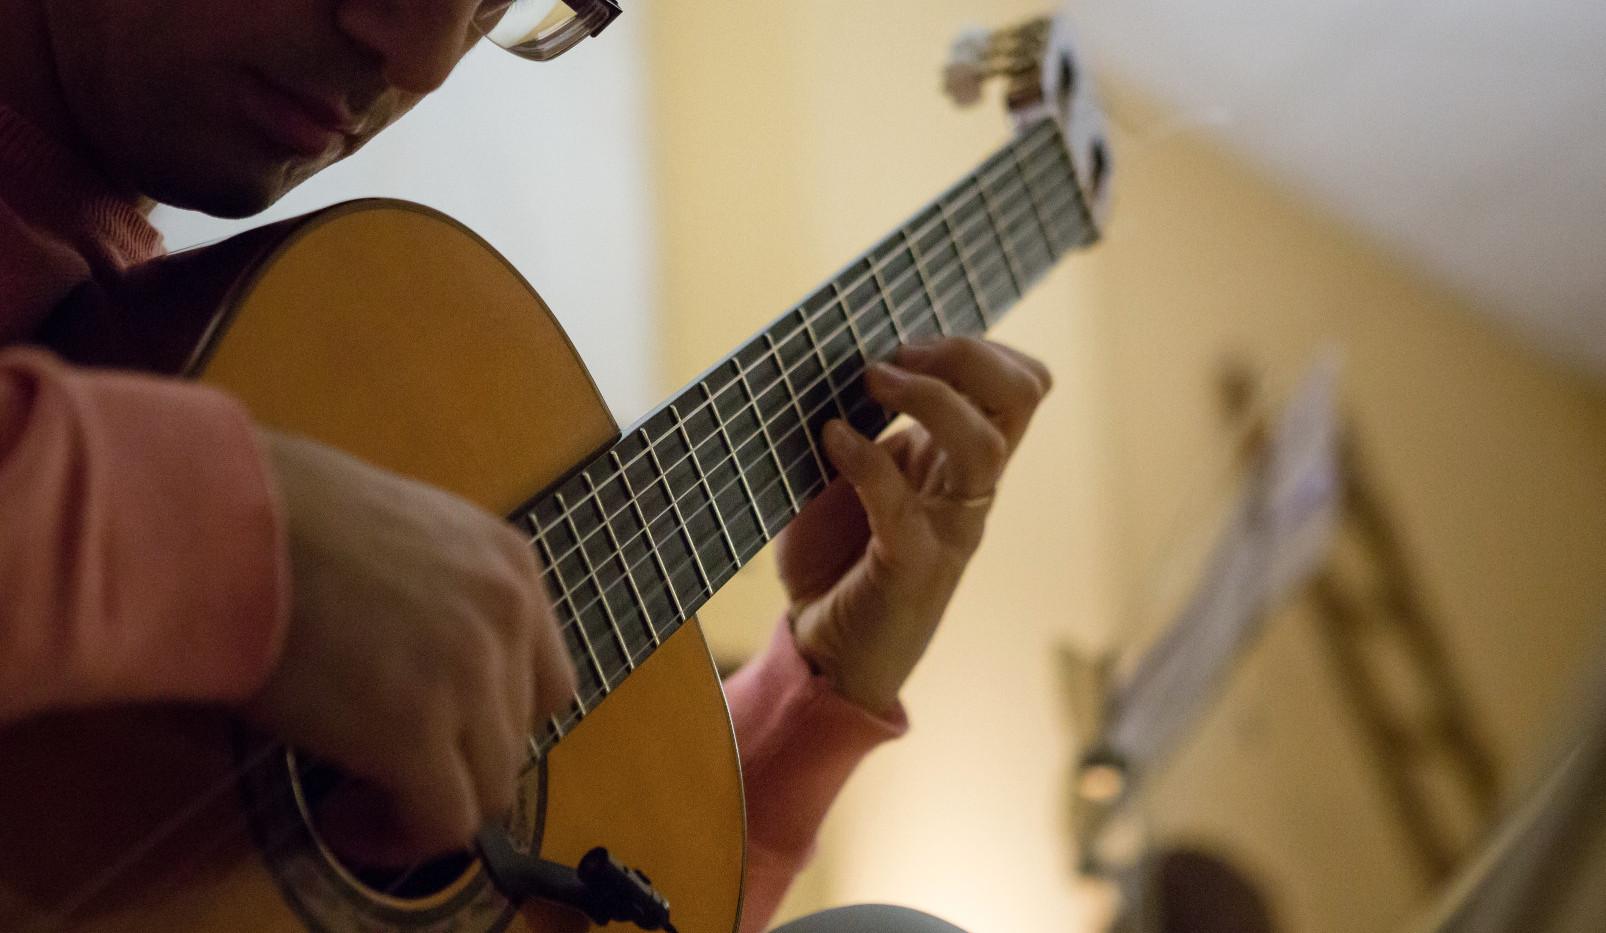 STEFANOS MAVRIDIS